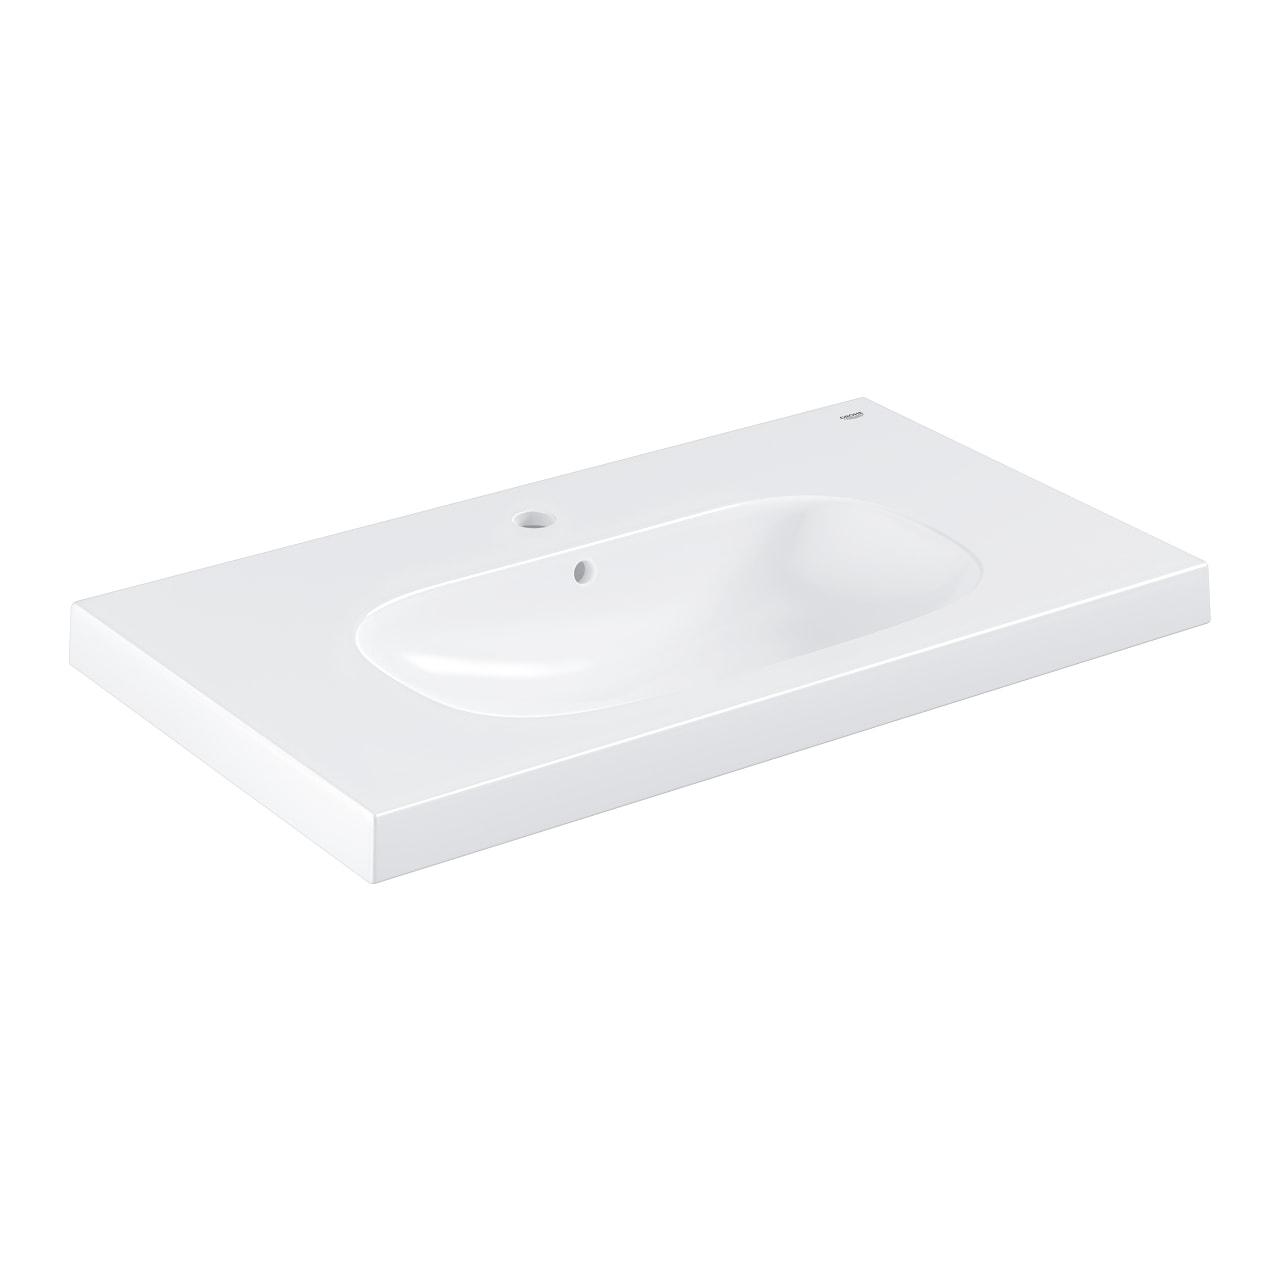 Umywalka naszafkowa GROHE Euro Ceramic 80 cm 3958400H